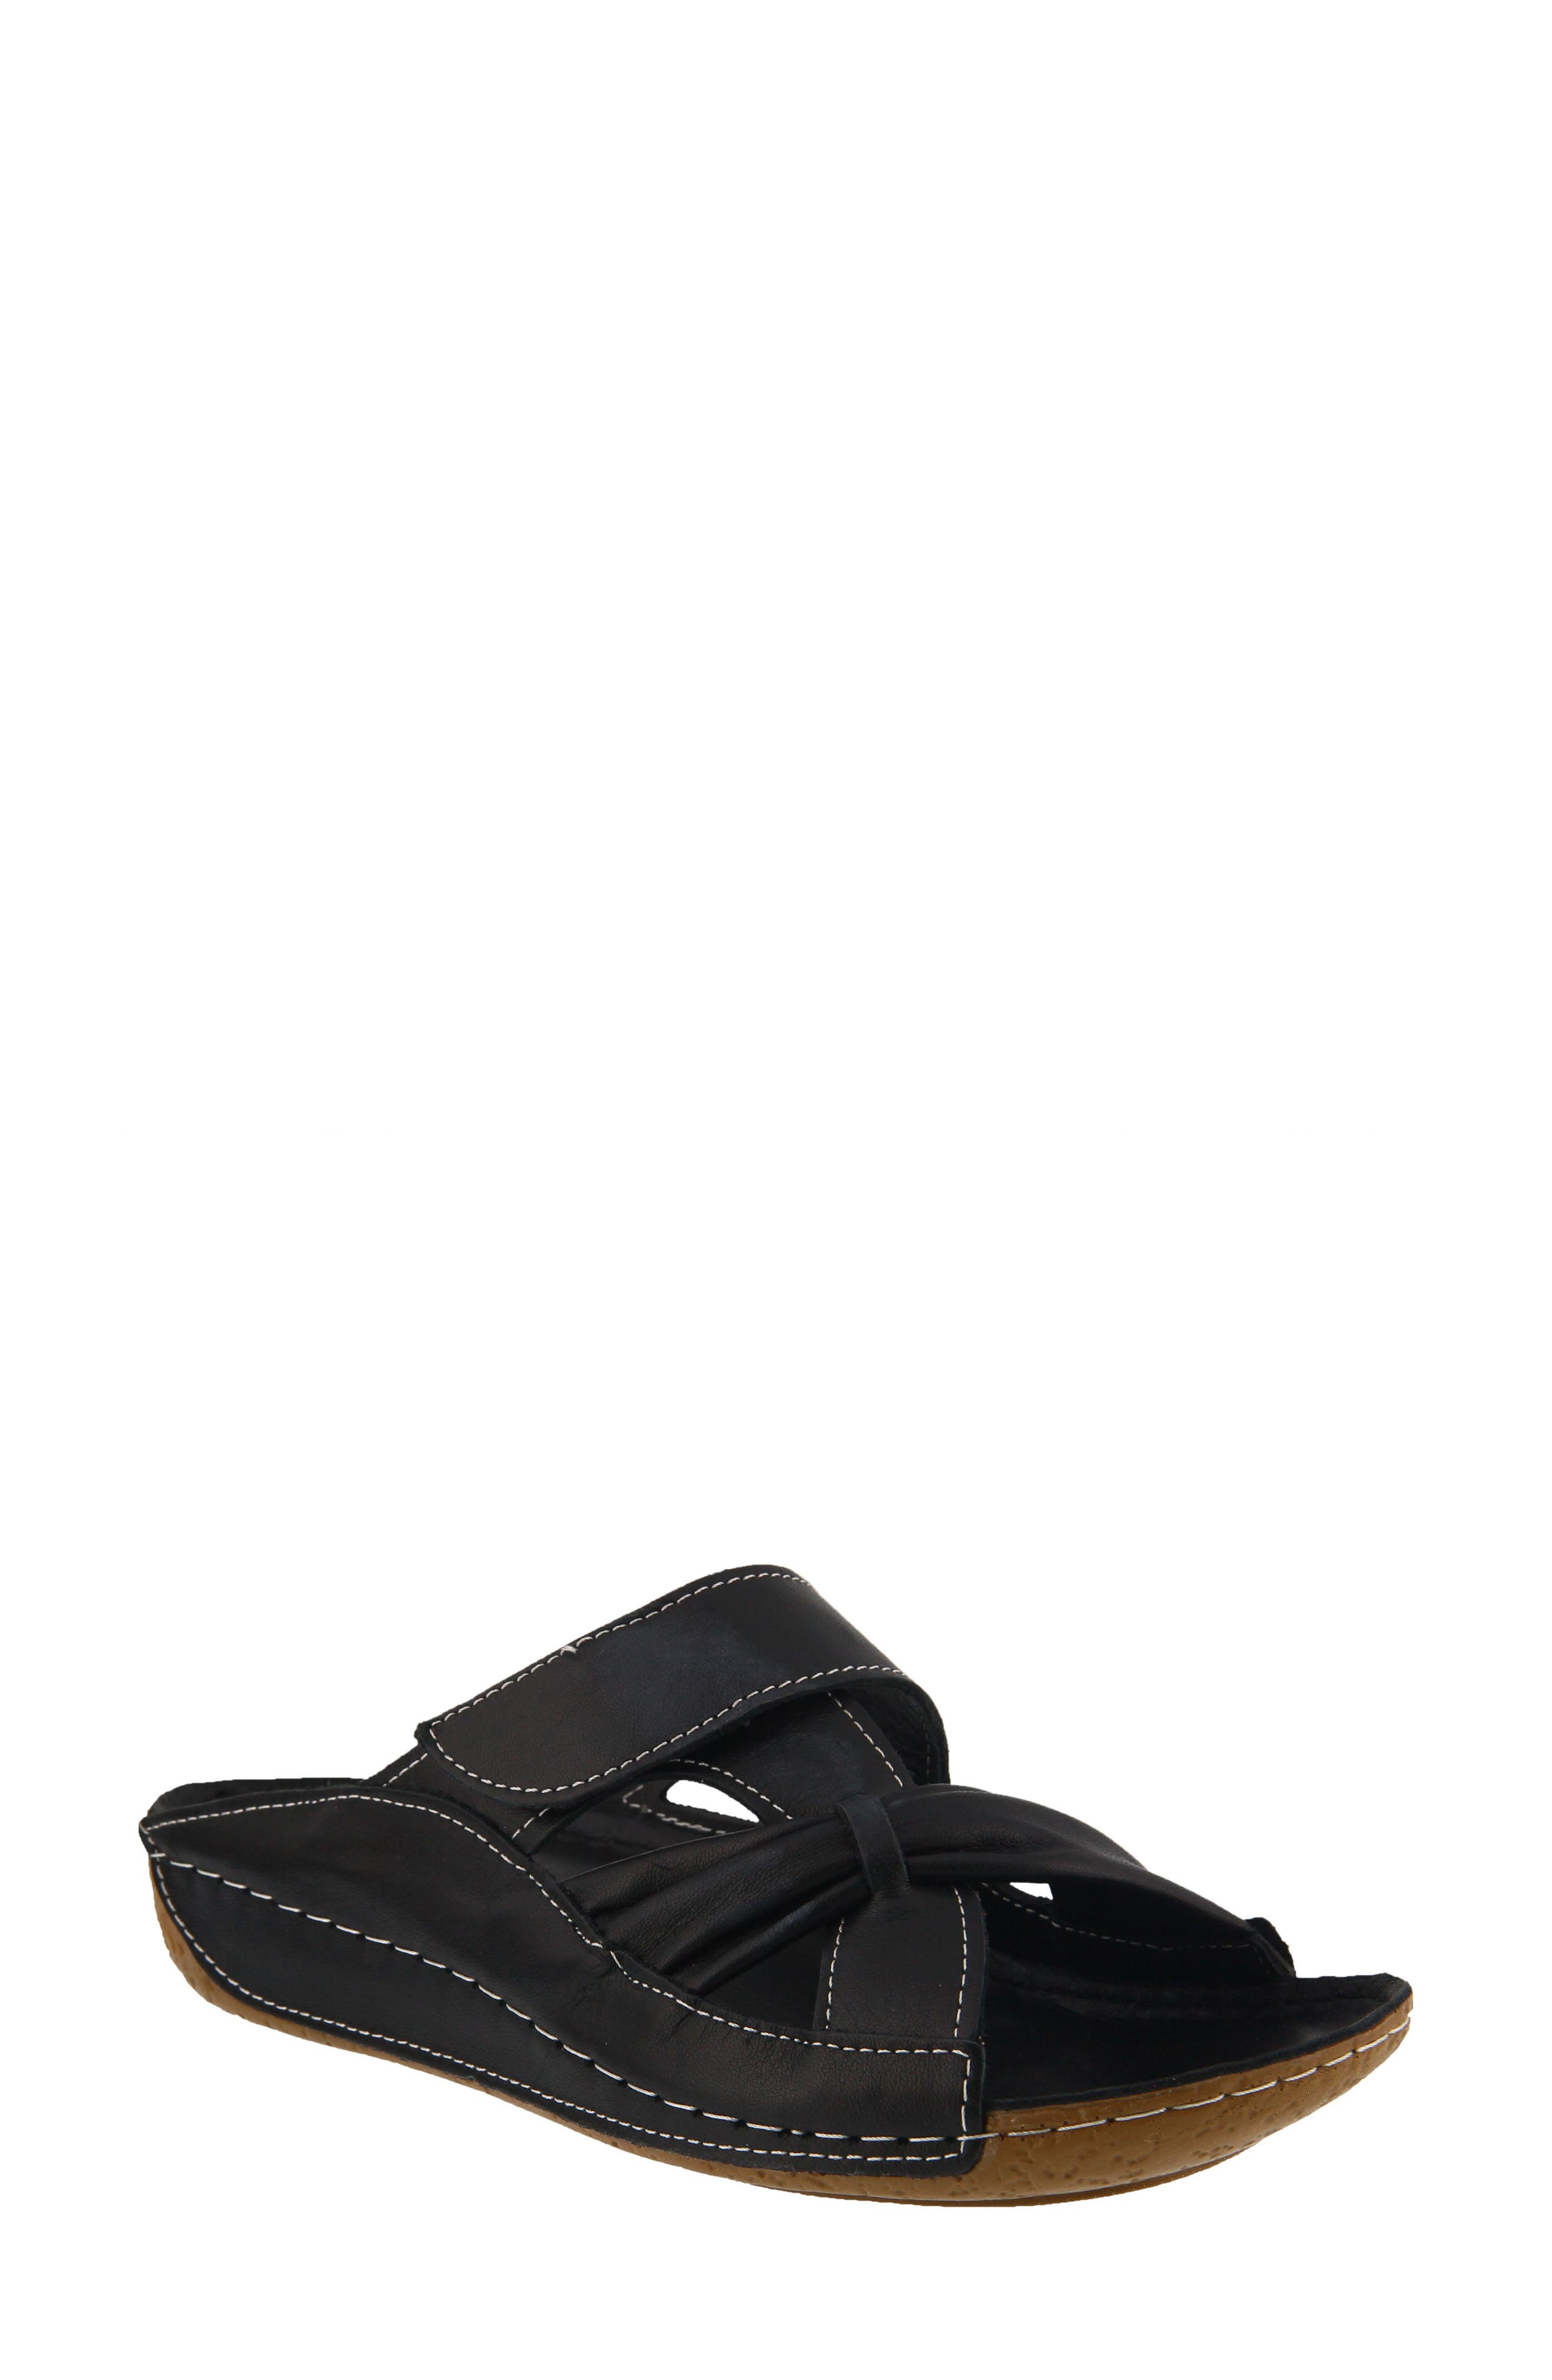 Gretta Sandal,                         Main,                         color, BLACK LEATHER